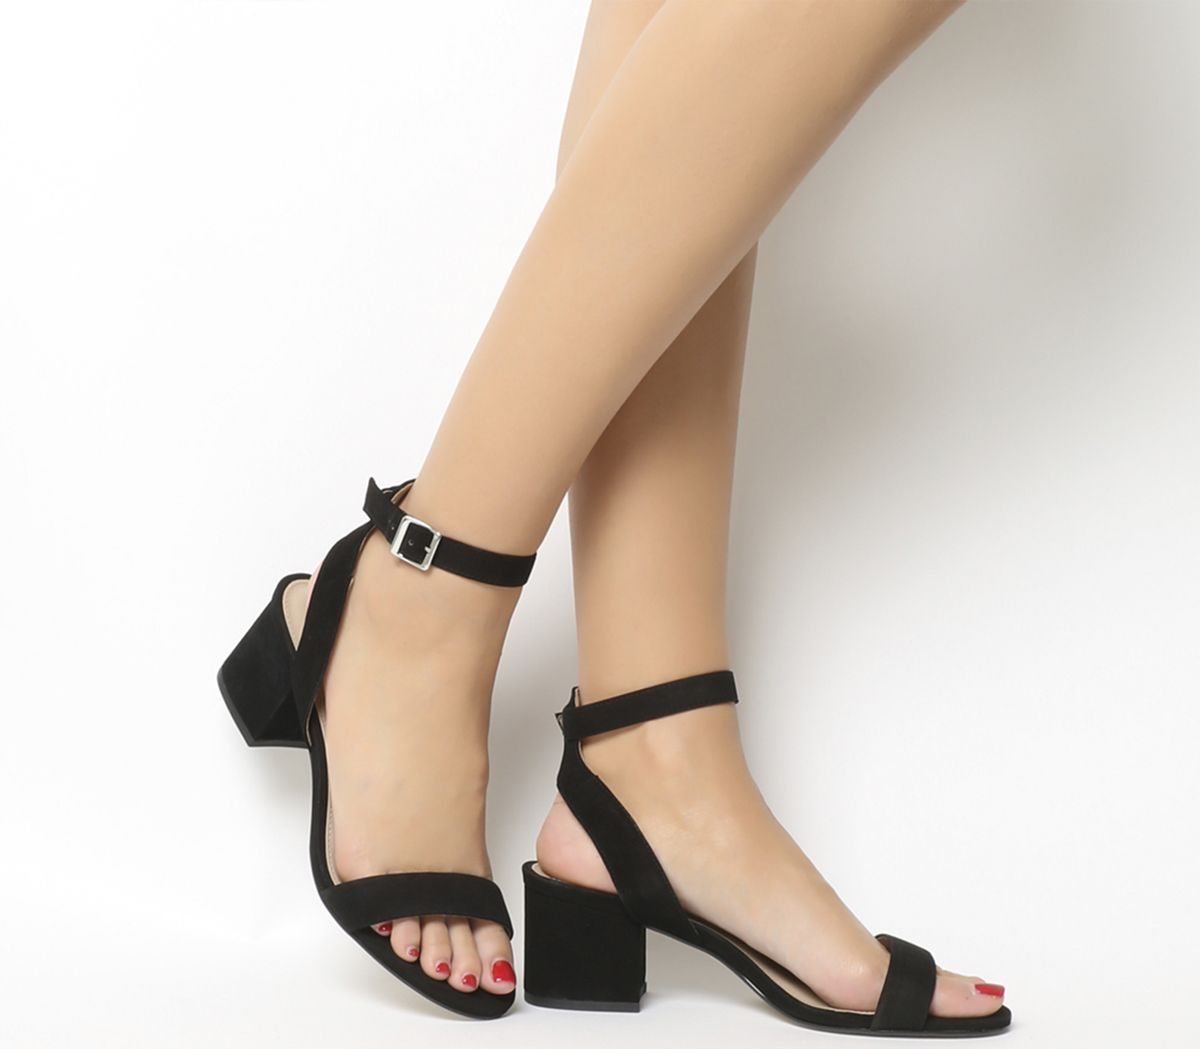 527f451f2b2 Office Make Up Sandals Black Nubuck - Mid Heels